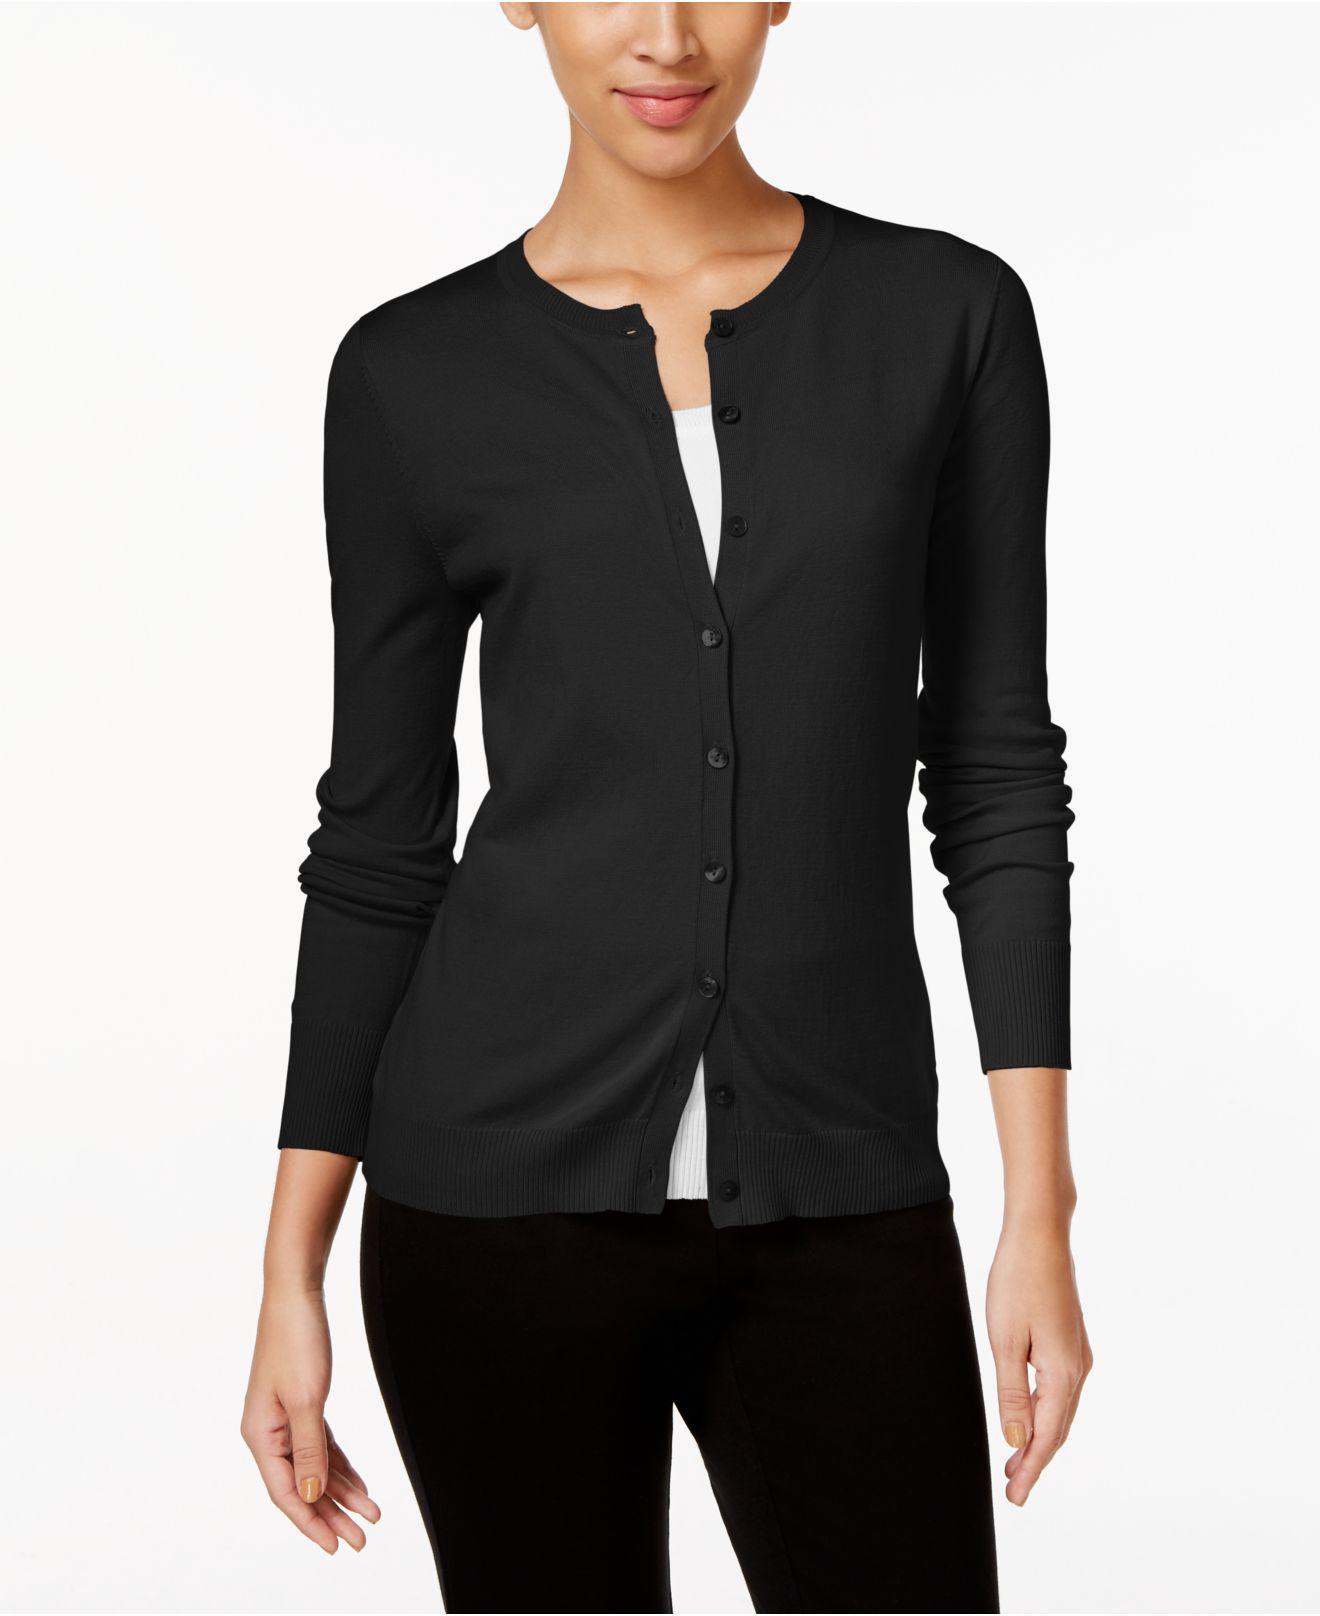 August silk Long-sleeve Cardigan in Black | Lyst